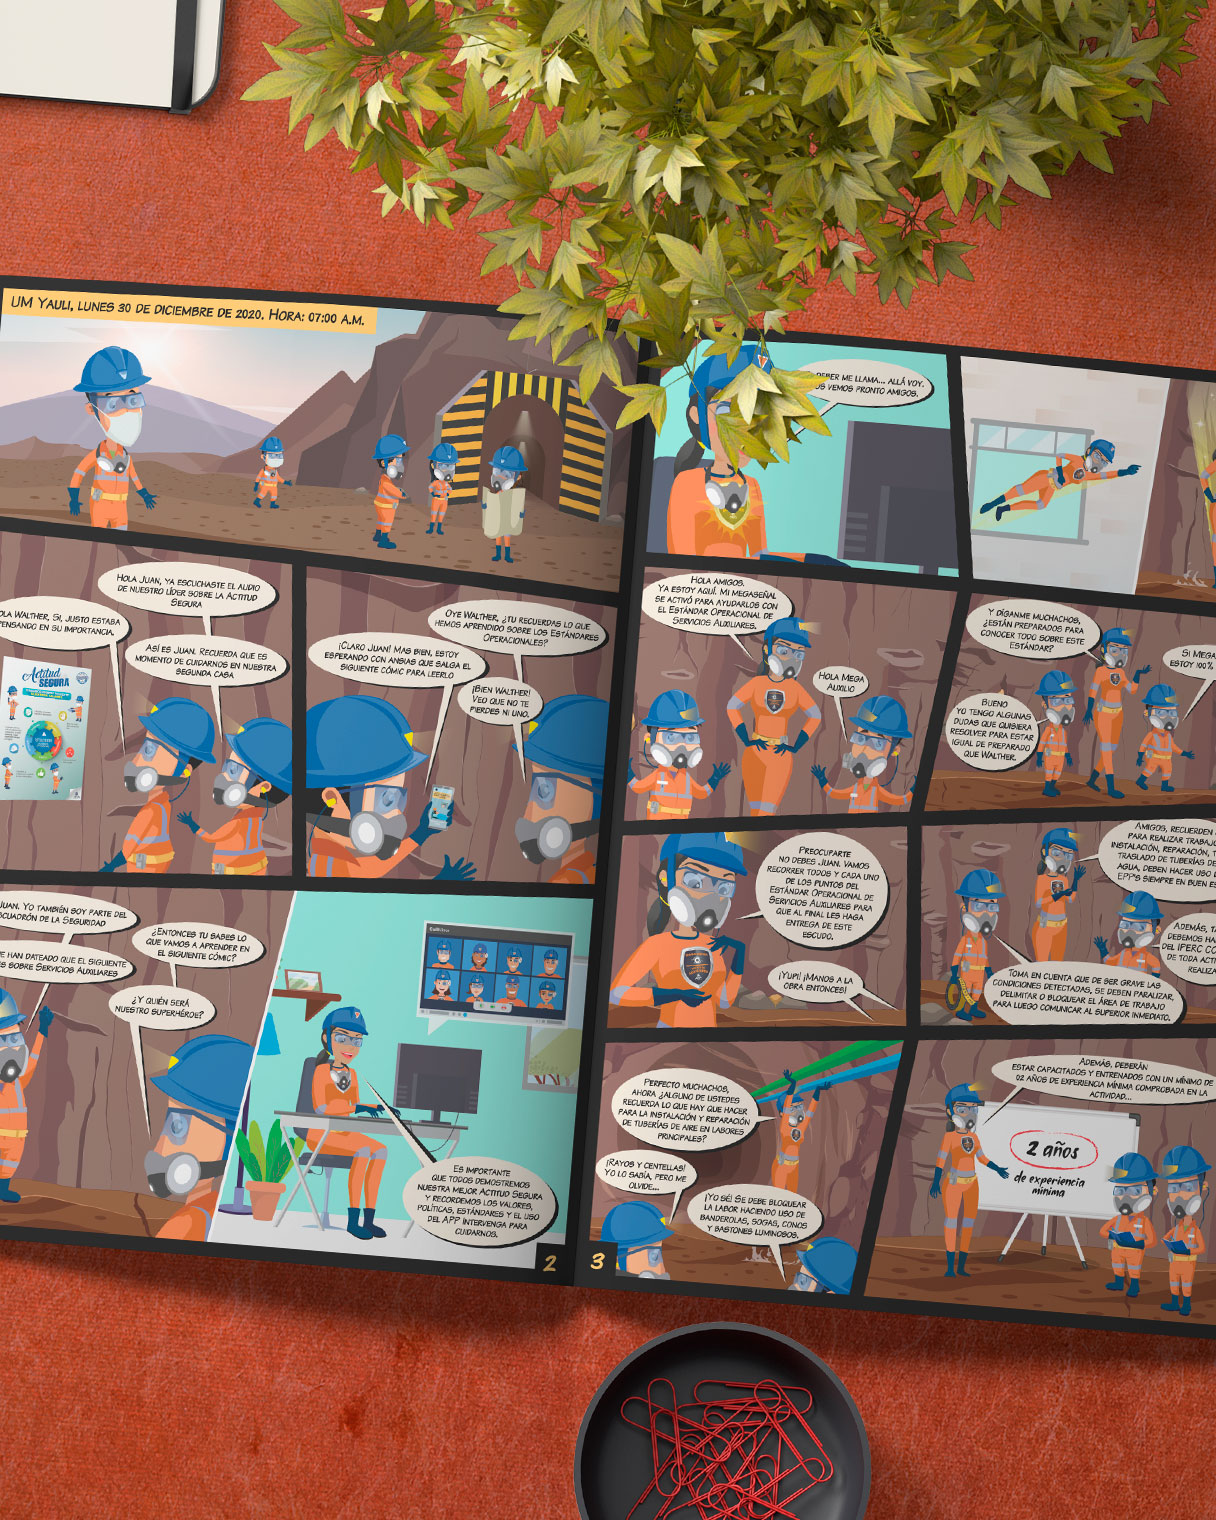 Diseño de Cómics para campaña de endomarketing